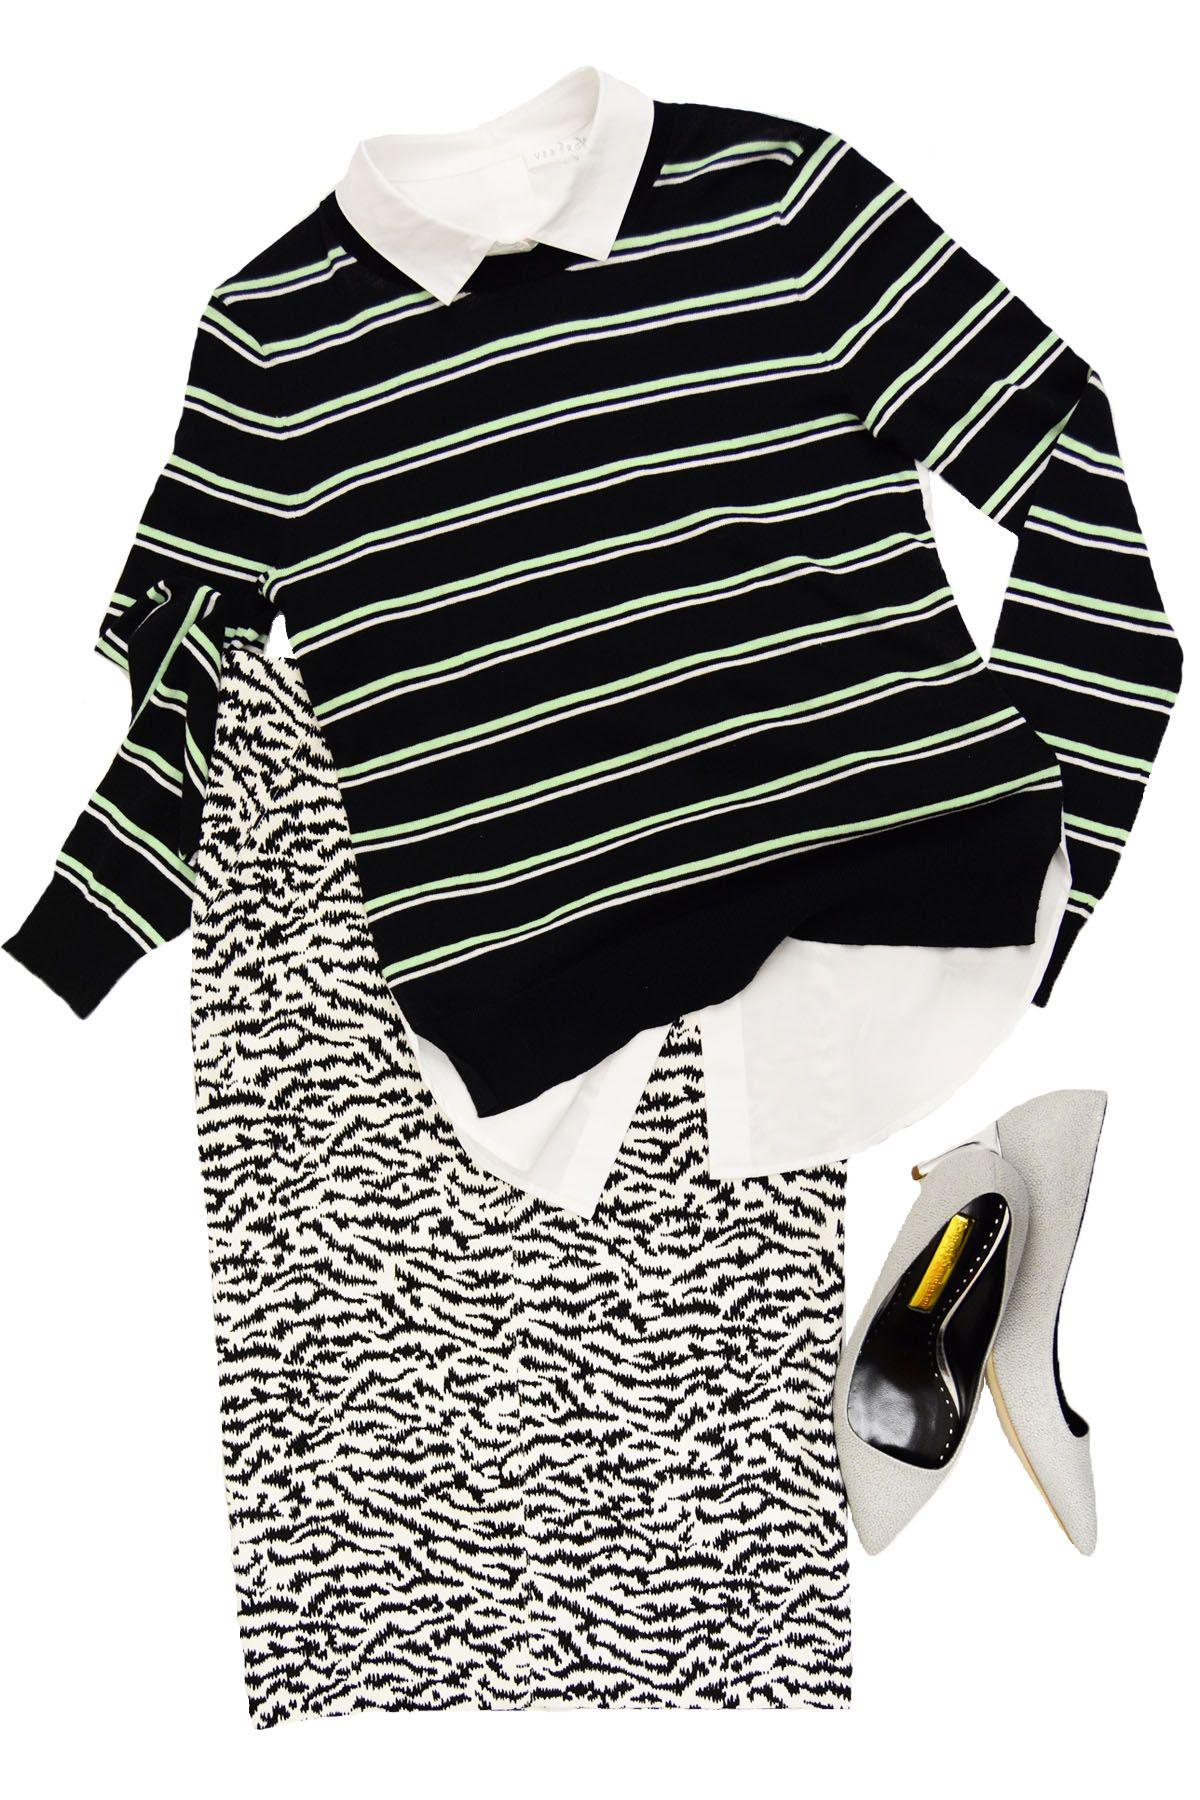 Veronica Beard Mint Striped Combo Sweater, Veronica Beard Tiger Skirt, Rupert Sanderson Lydia Pebble Shoe